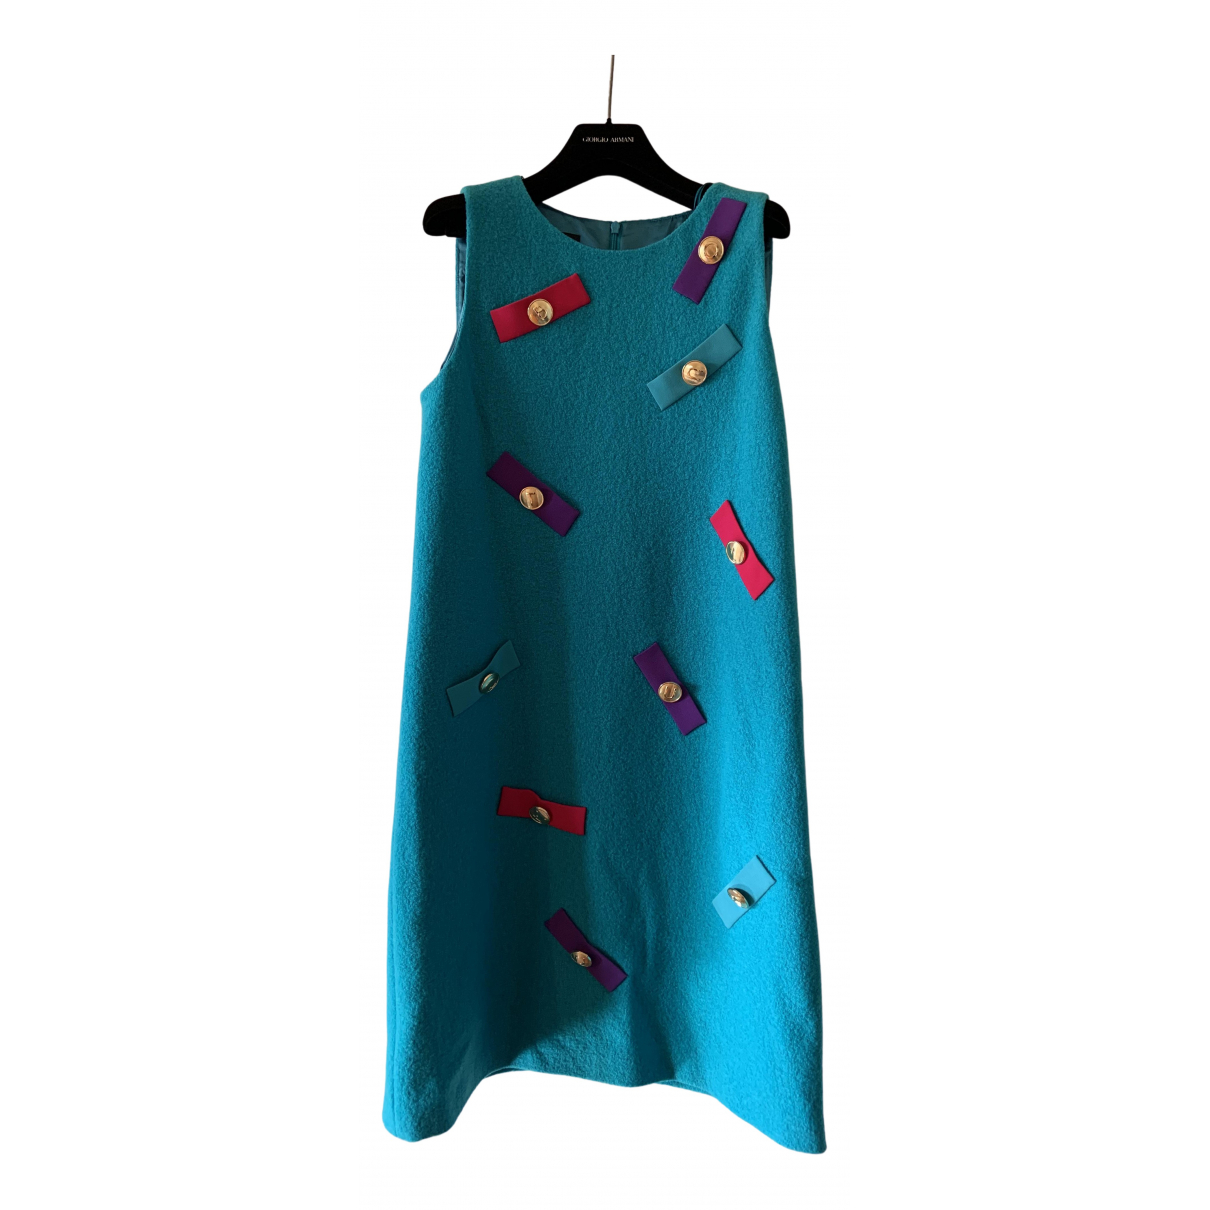 Moschino \N Kleid in  Tuerkis Wolle